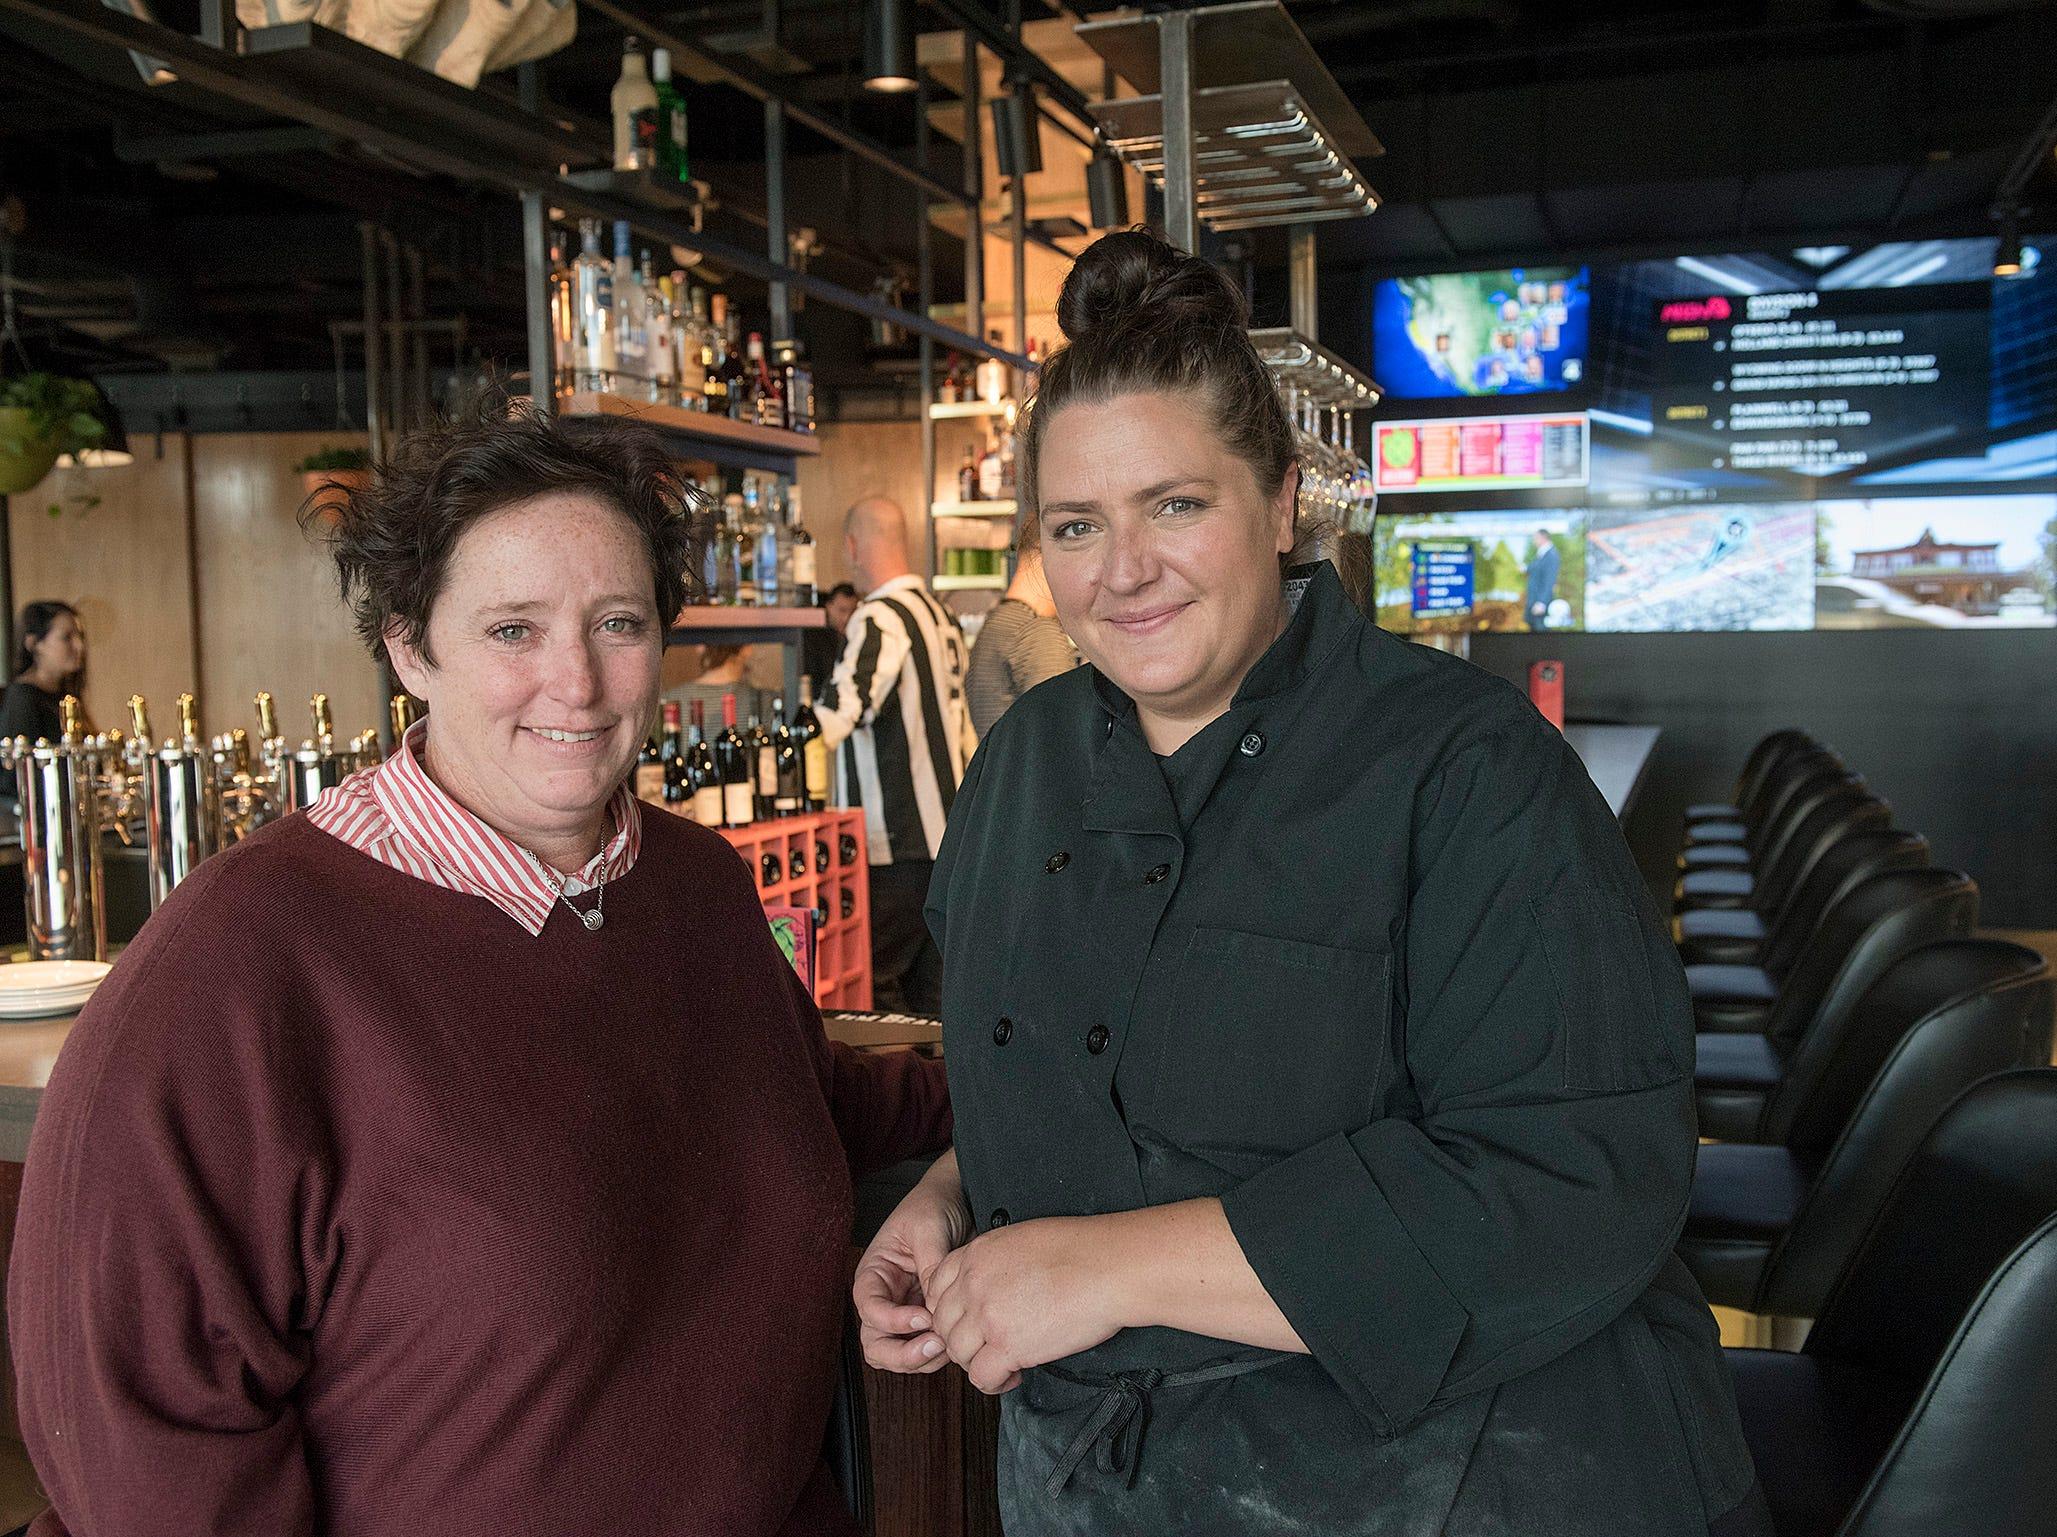 New downtown Birmingham eatery serves comfort food, trending cuisine, global fare